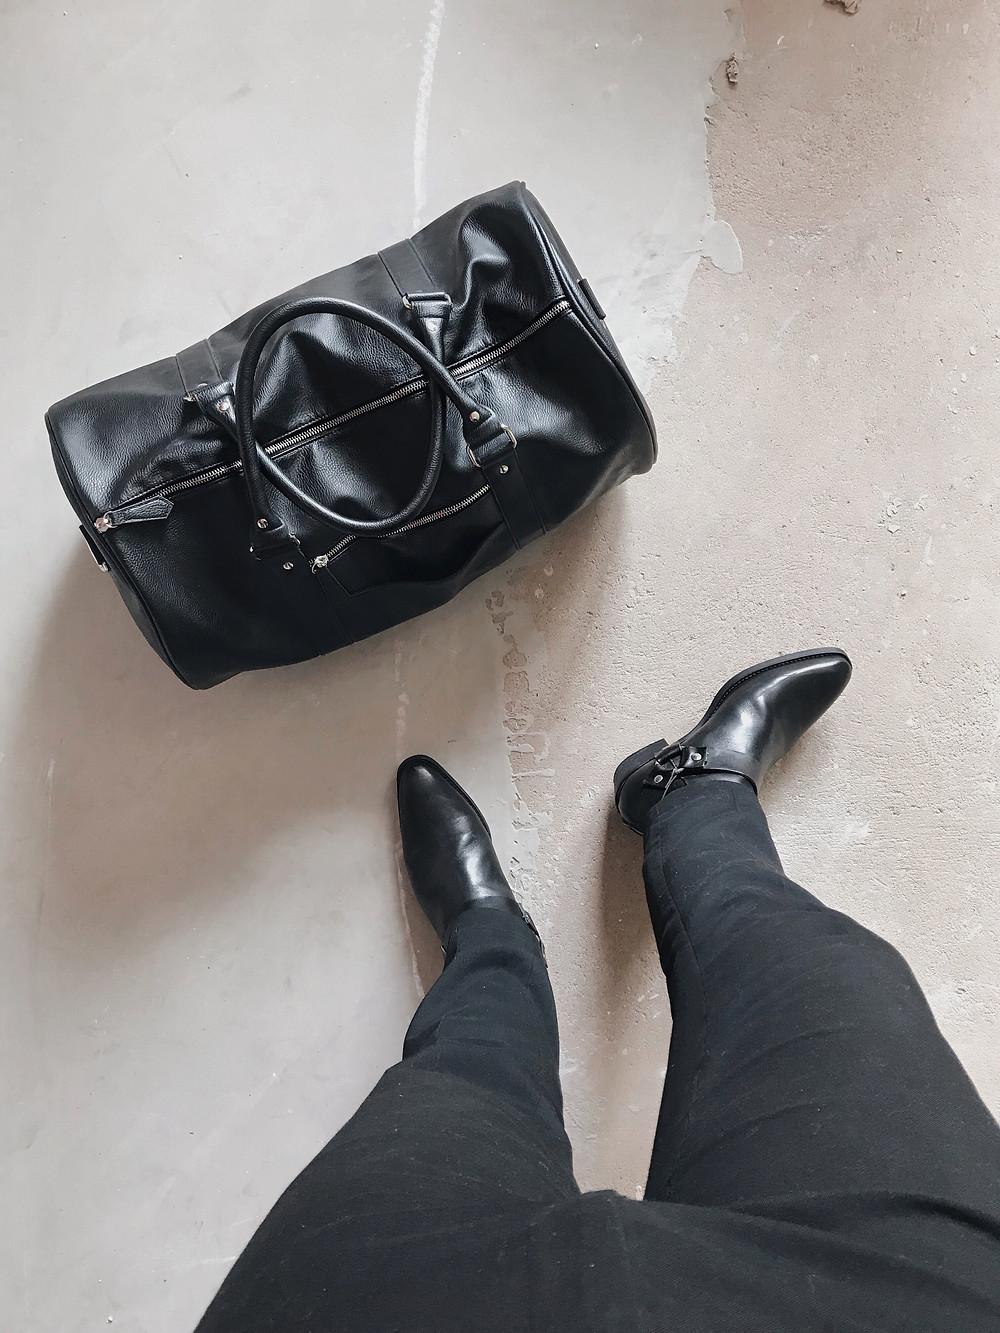 Sam Barnes FTM Top Surgery Packing List Bag